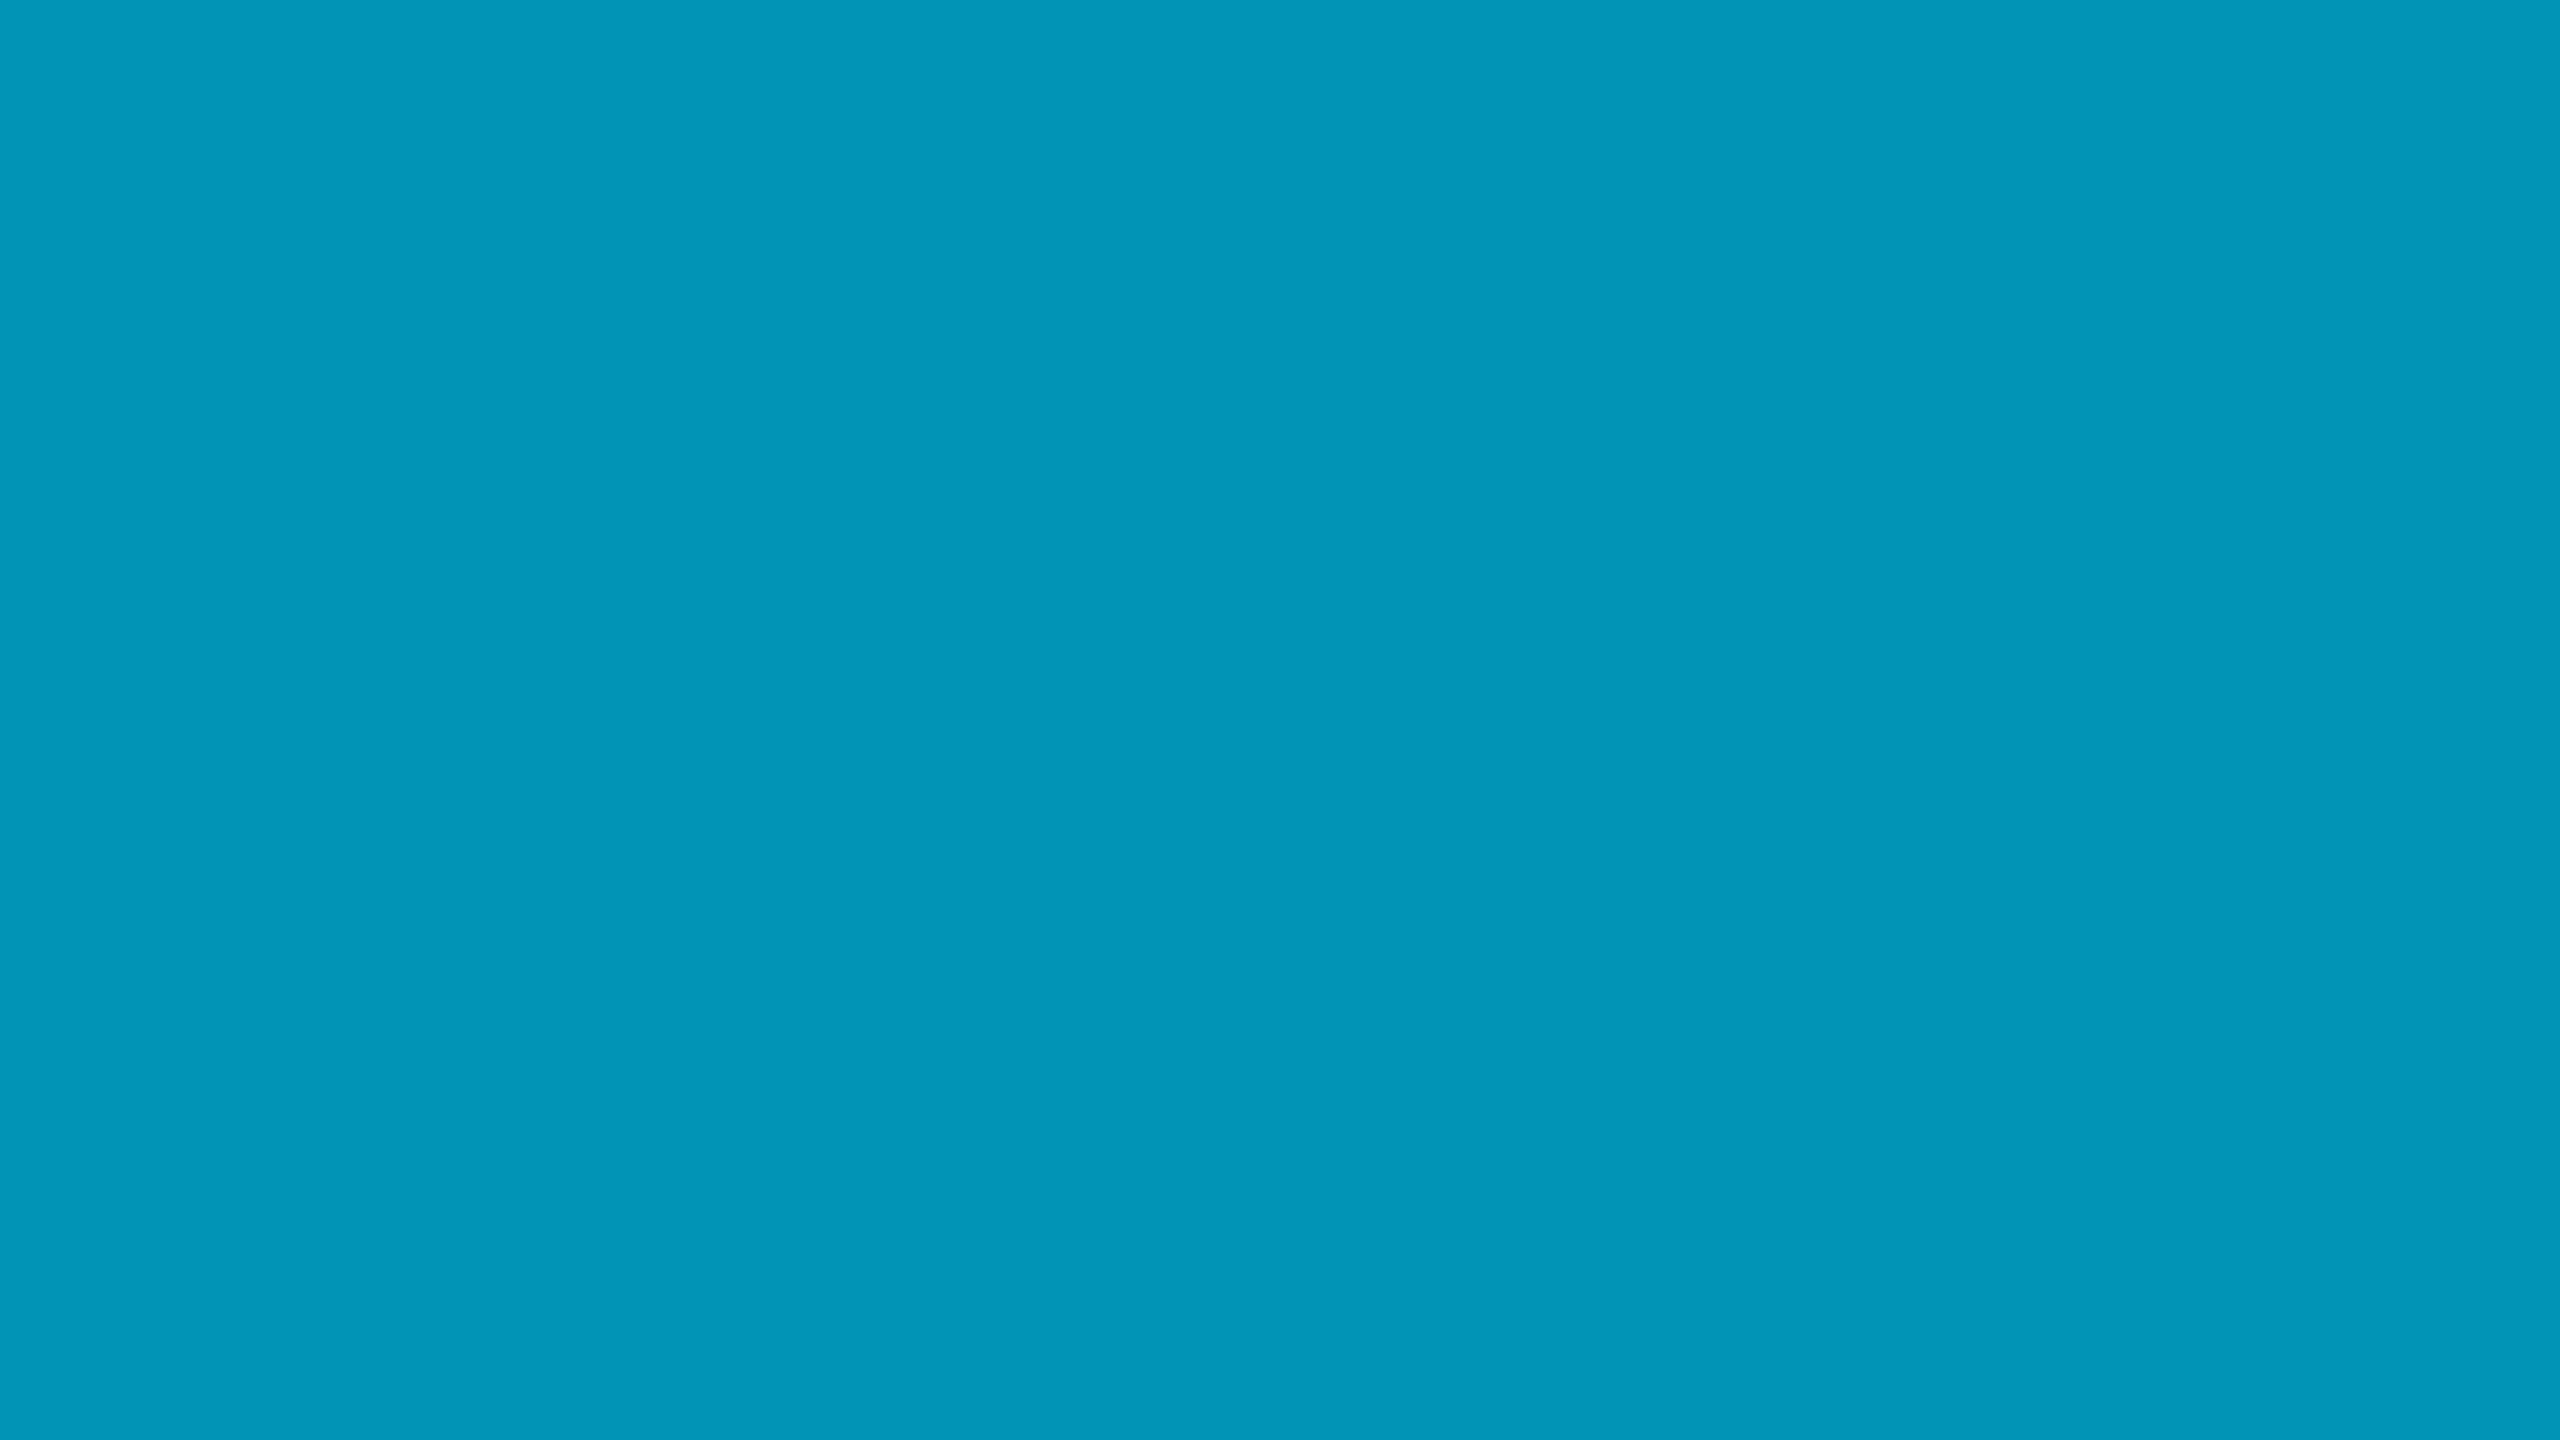 2560x1440 Bondi Blue Solid Color Background